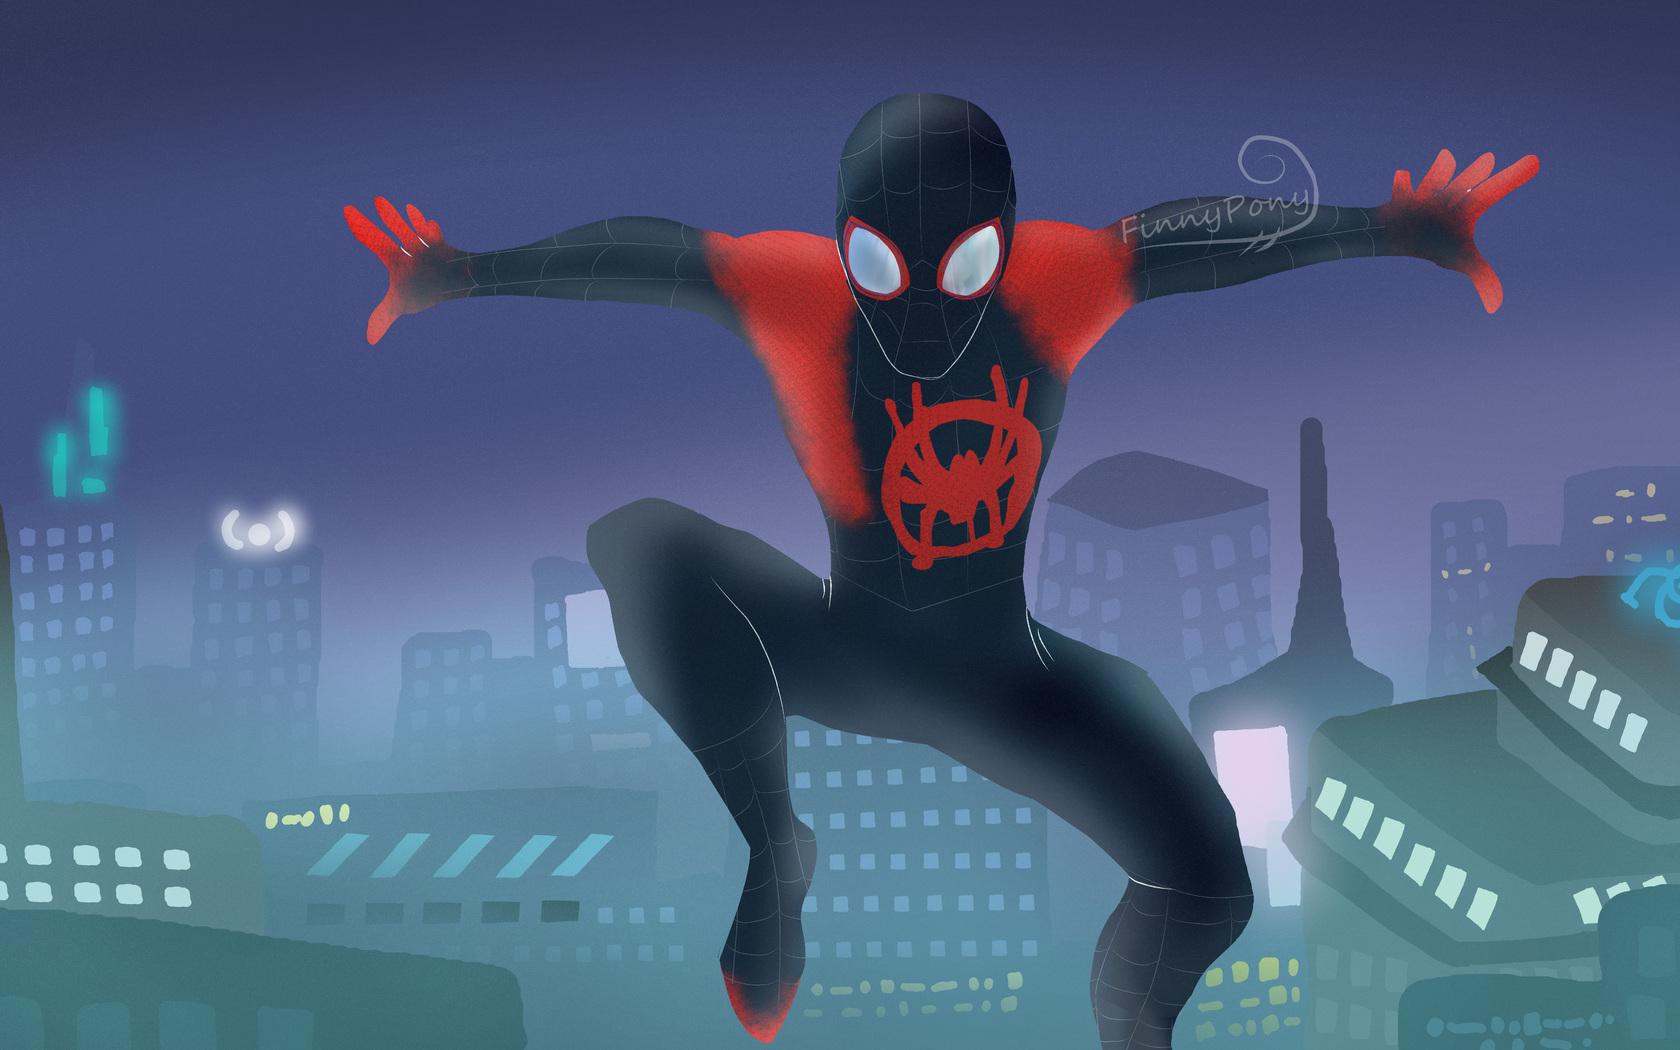 spiderman-miles-morales-12k-qo.jpg